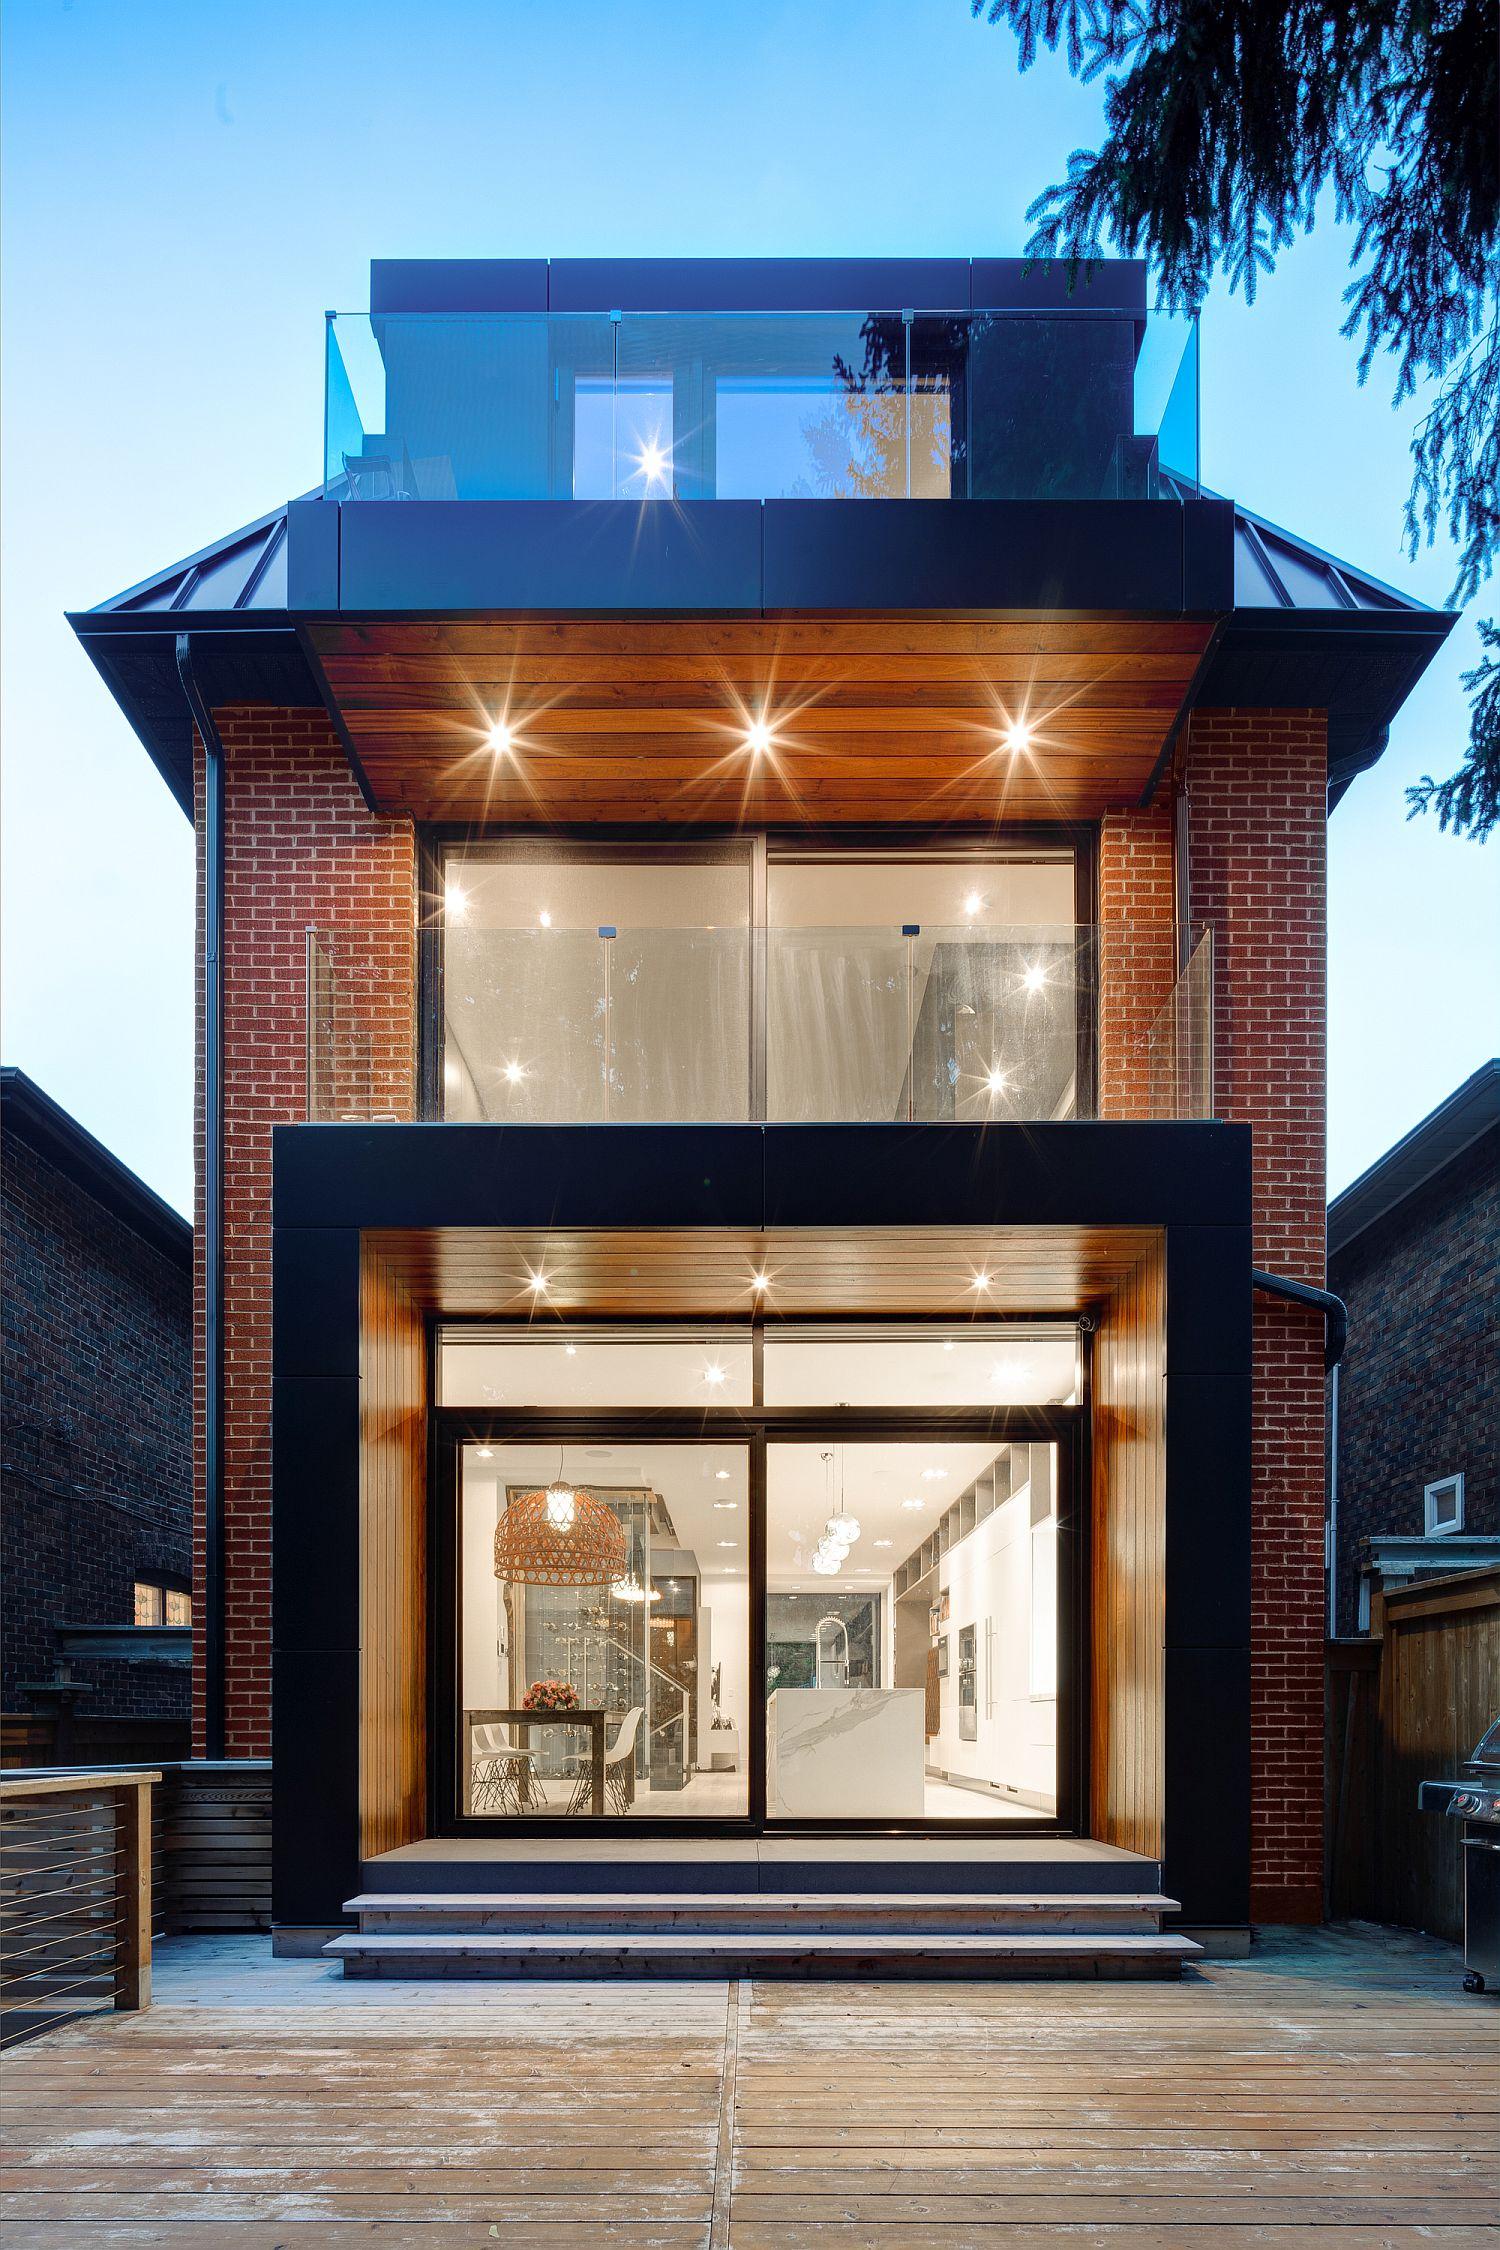 Dark-window-frames-and-brick-walls-combined-beautifully-at-the-NY-House